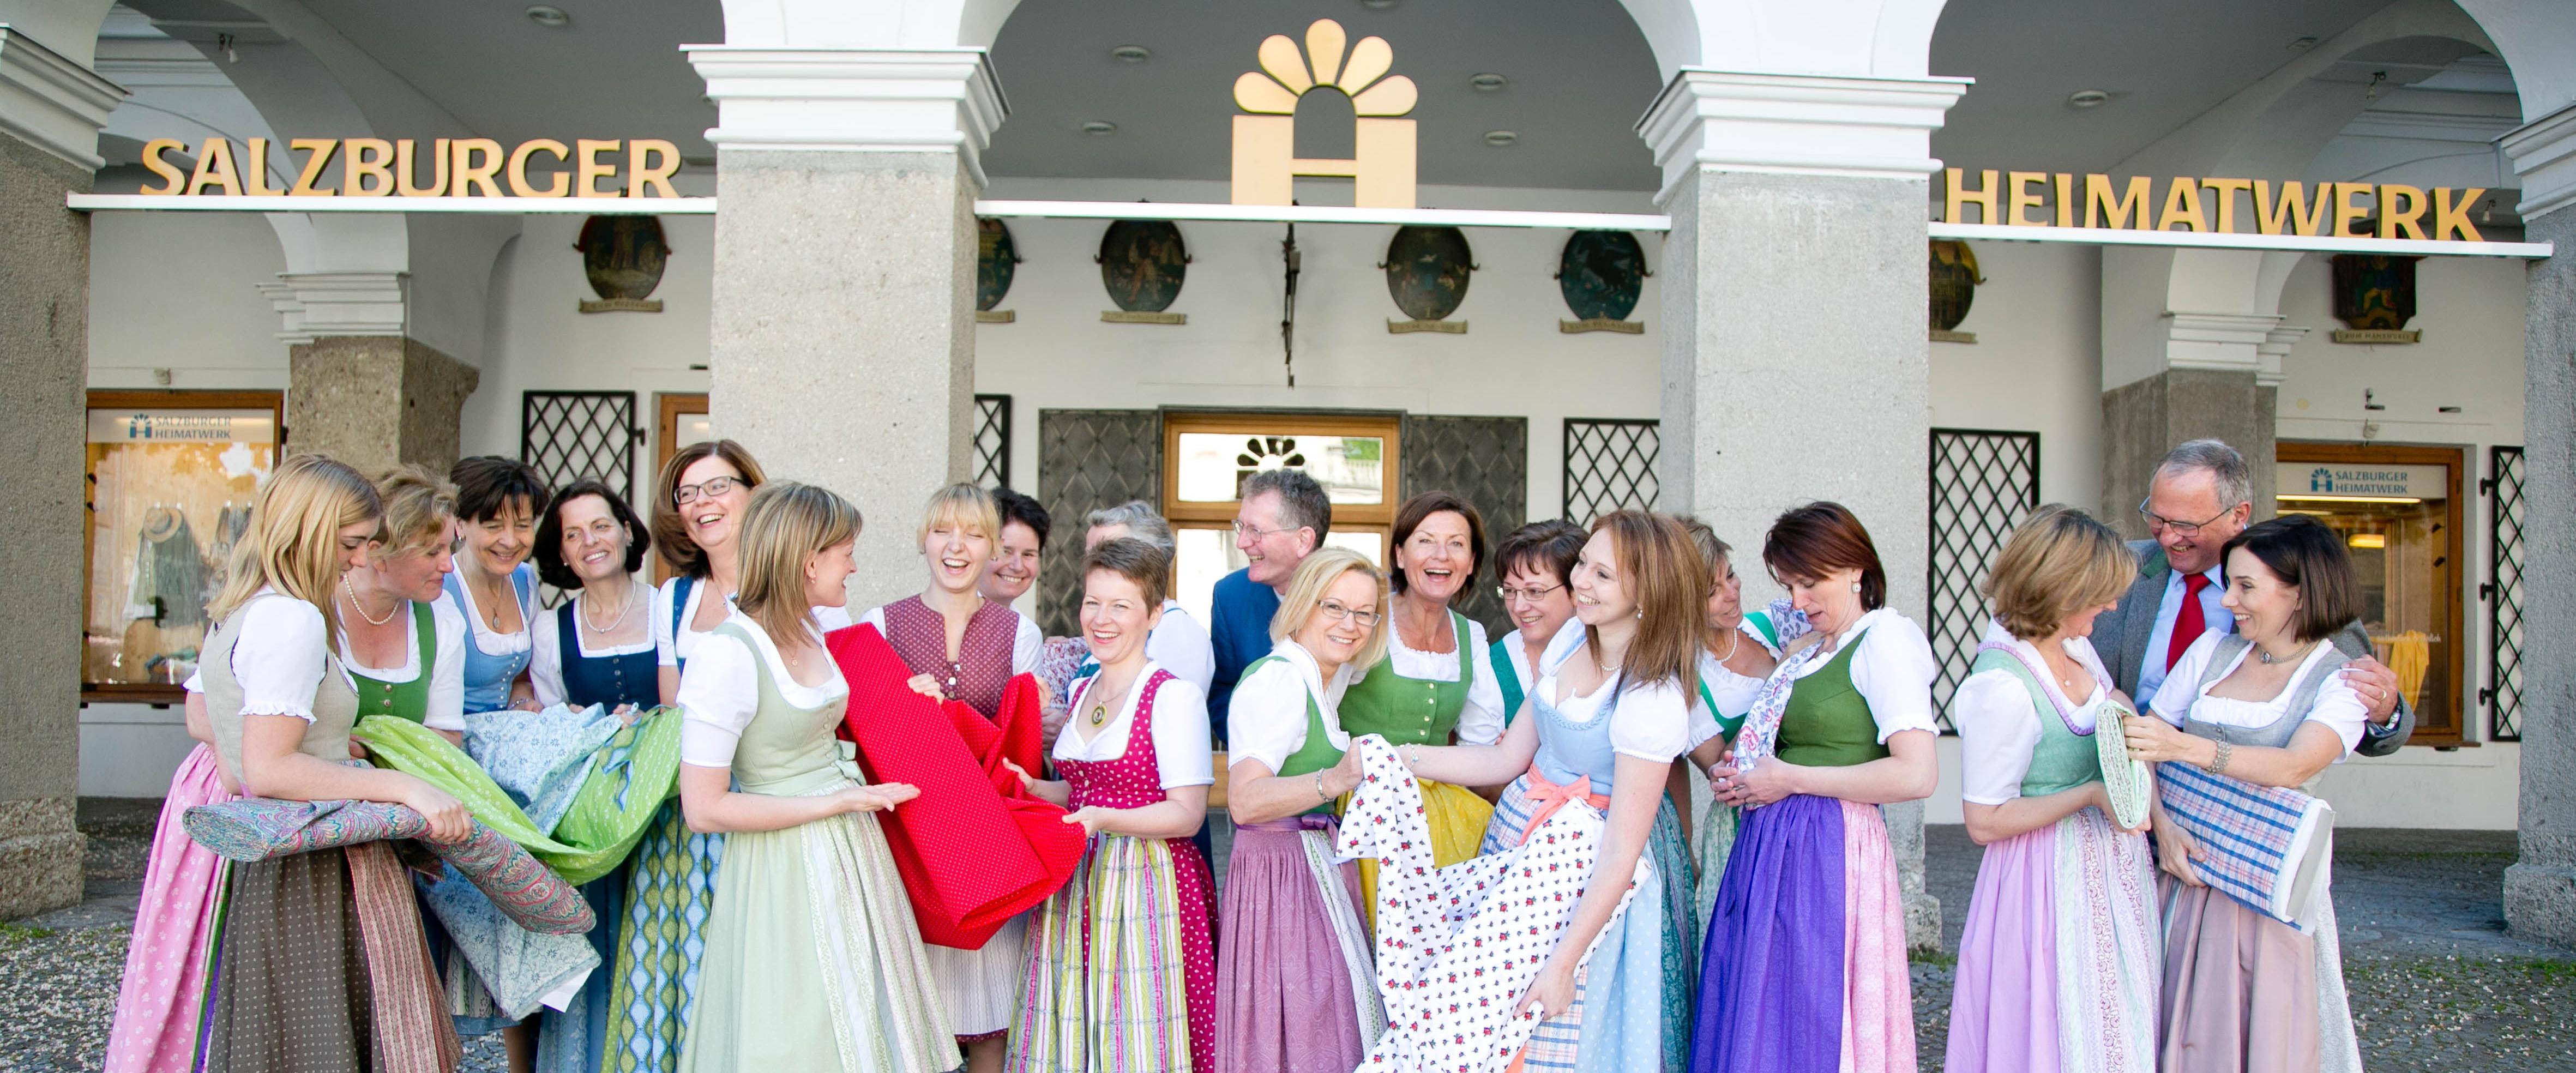 ff4d9a3f6c7c0c Salzburger Heimatwerk